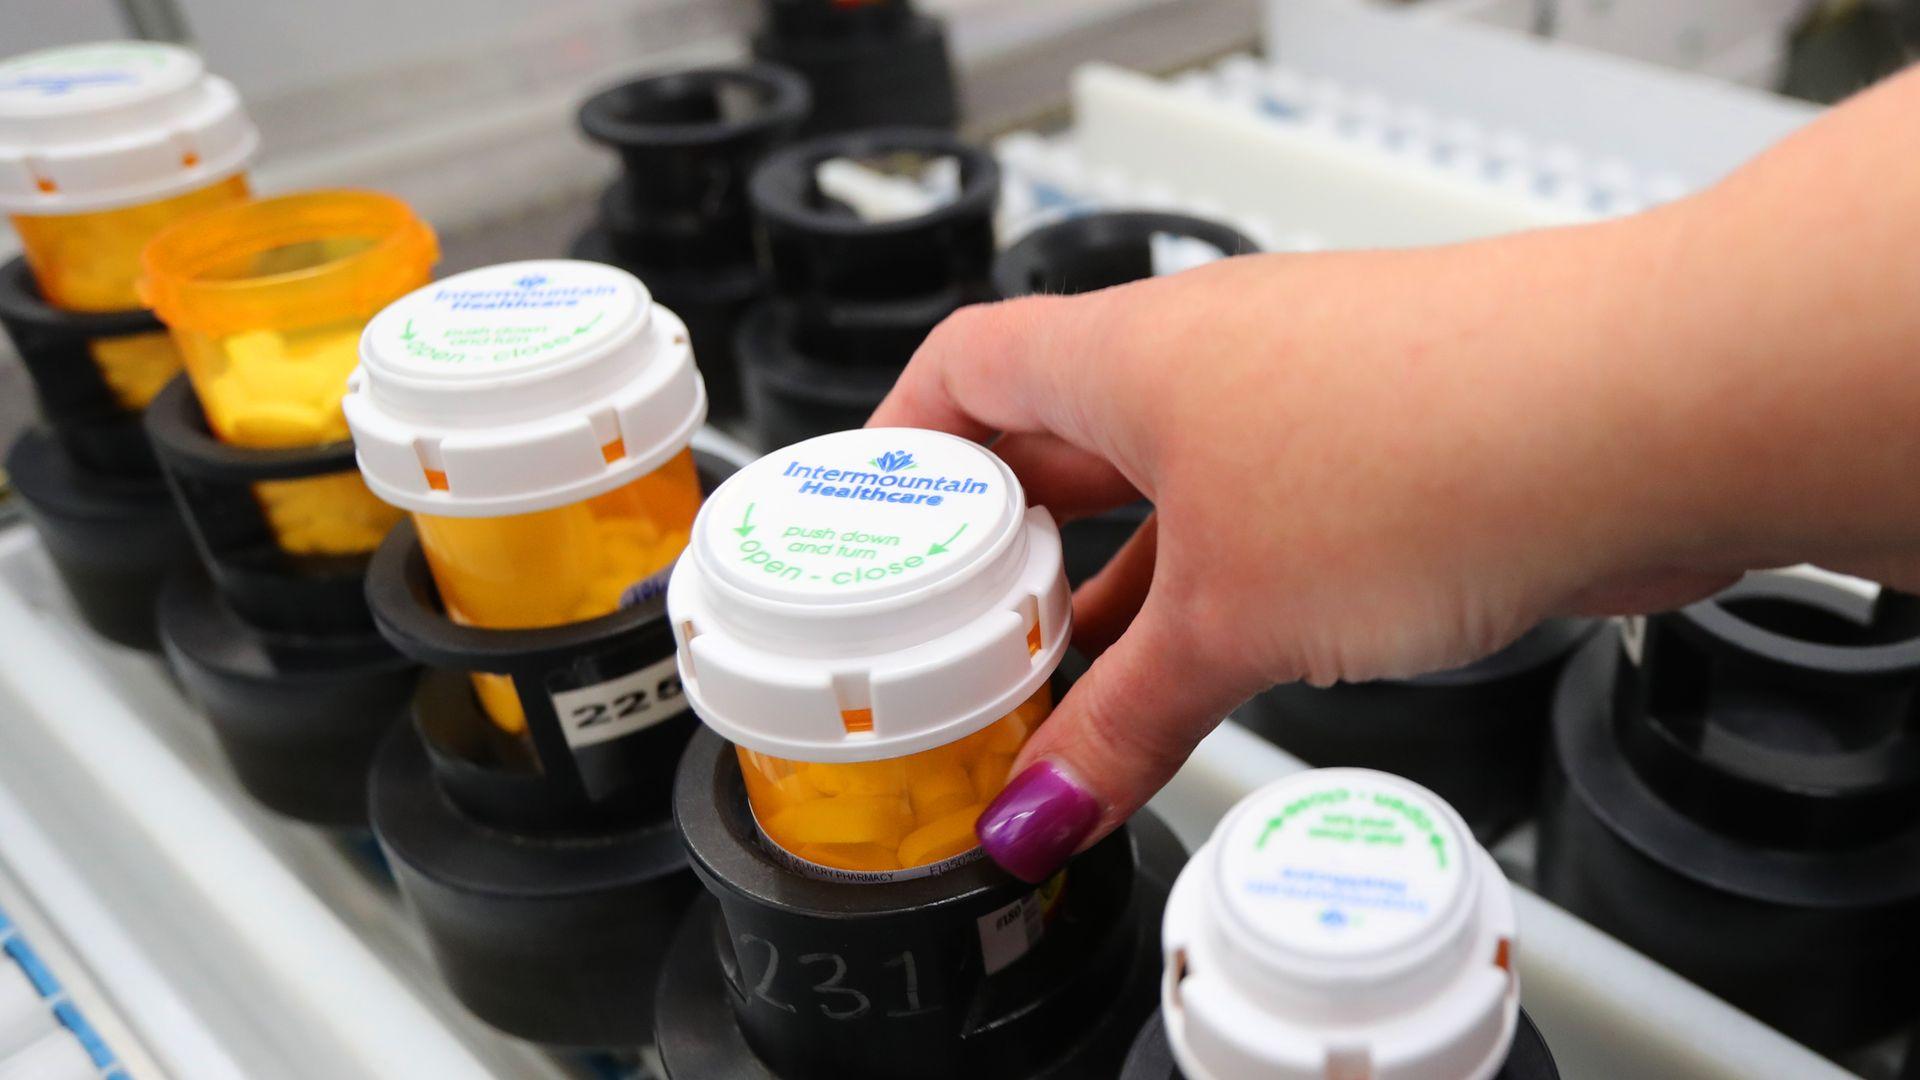 axios.com - Pharma lobbying for Medicare 'fix' in opioids bill